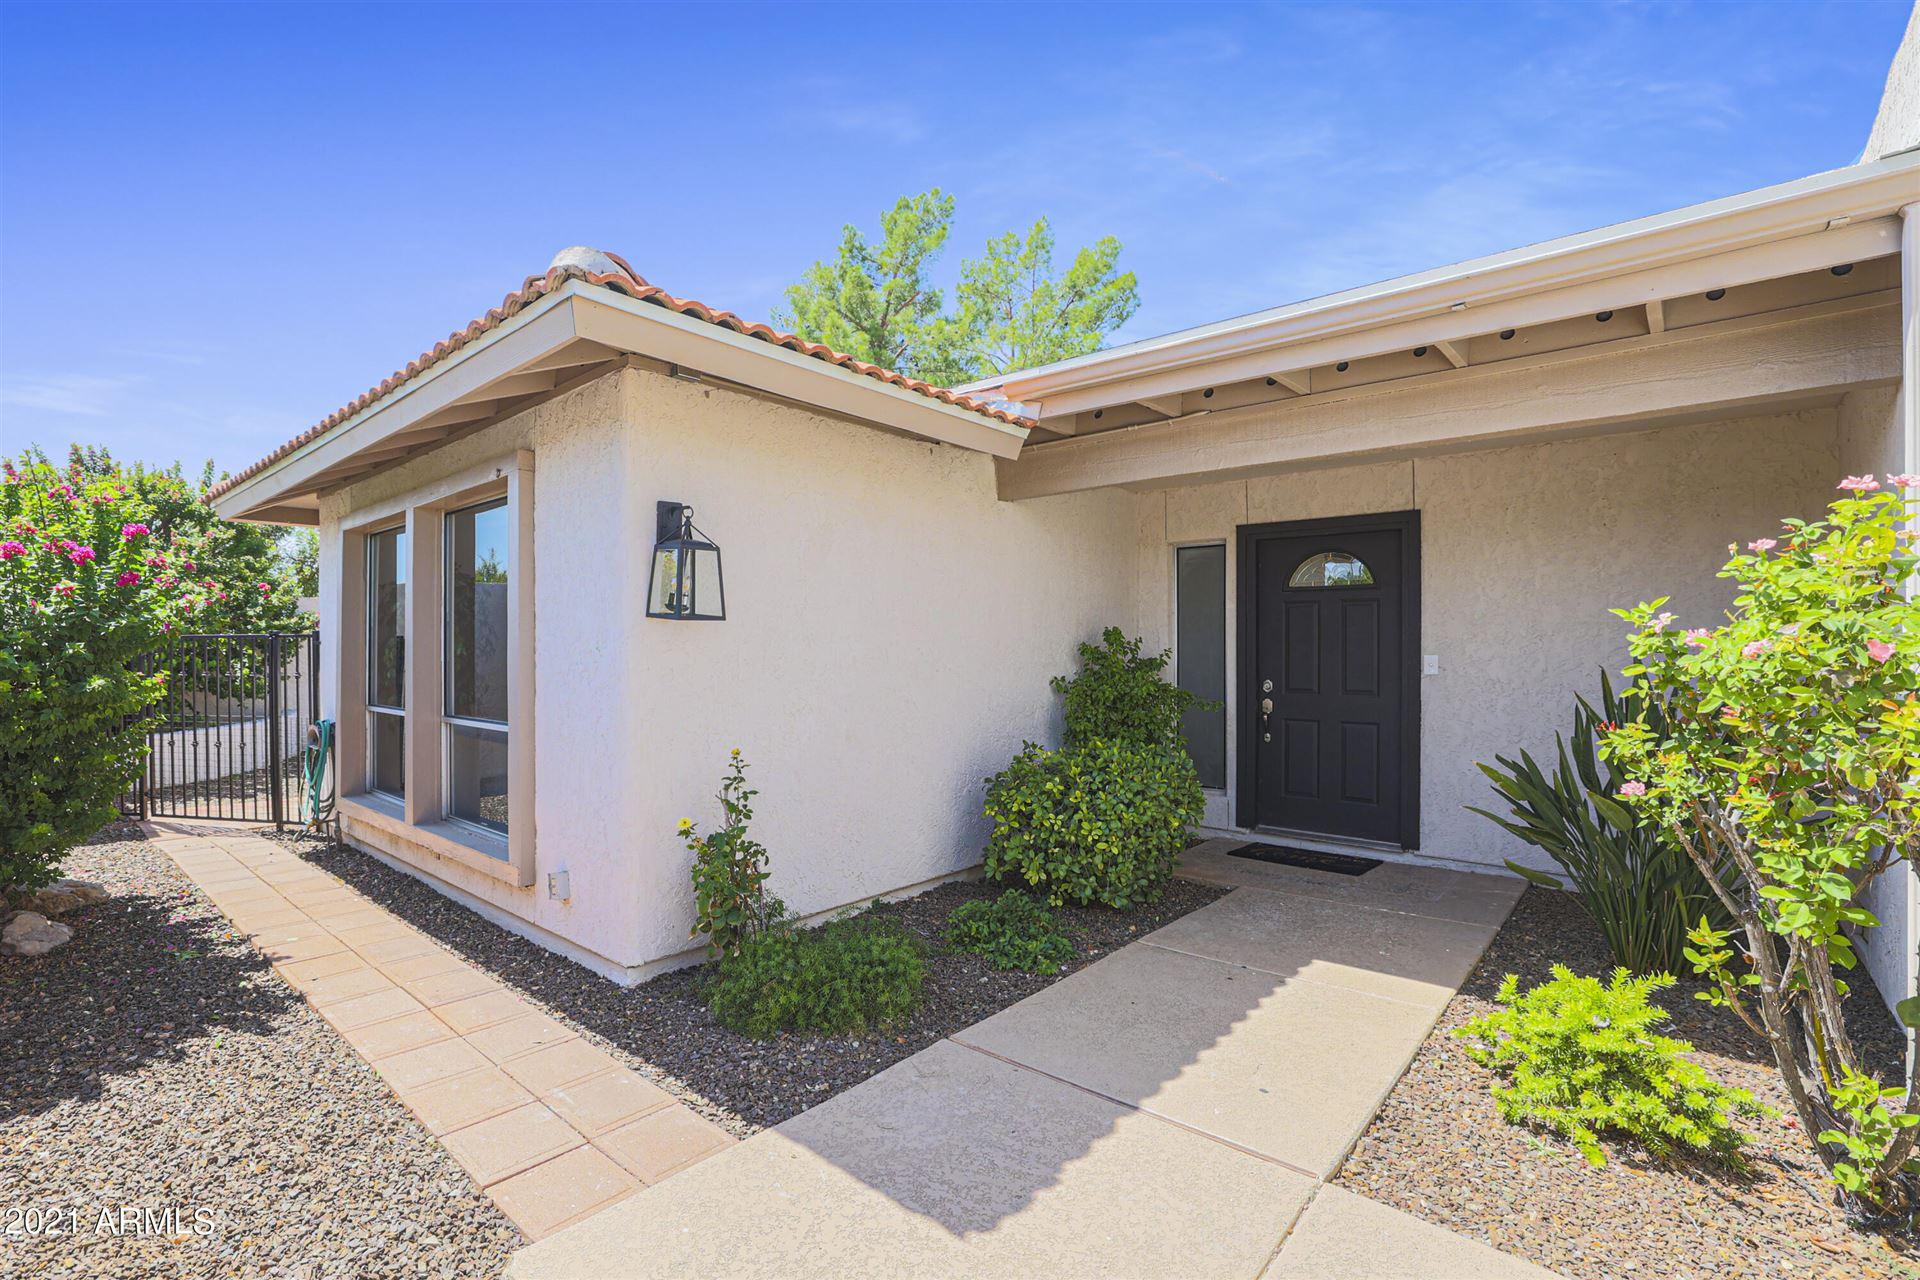 7012 N VIA NUEVA --, Scottsdale, AZ 85258 - MLS#: 6289270